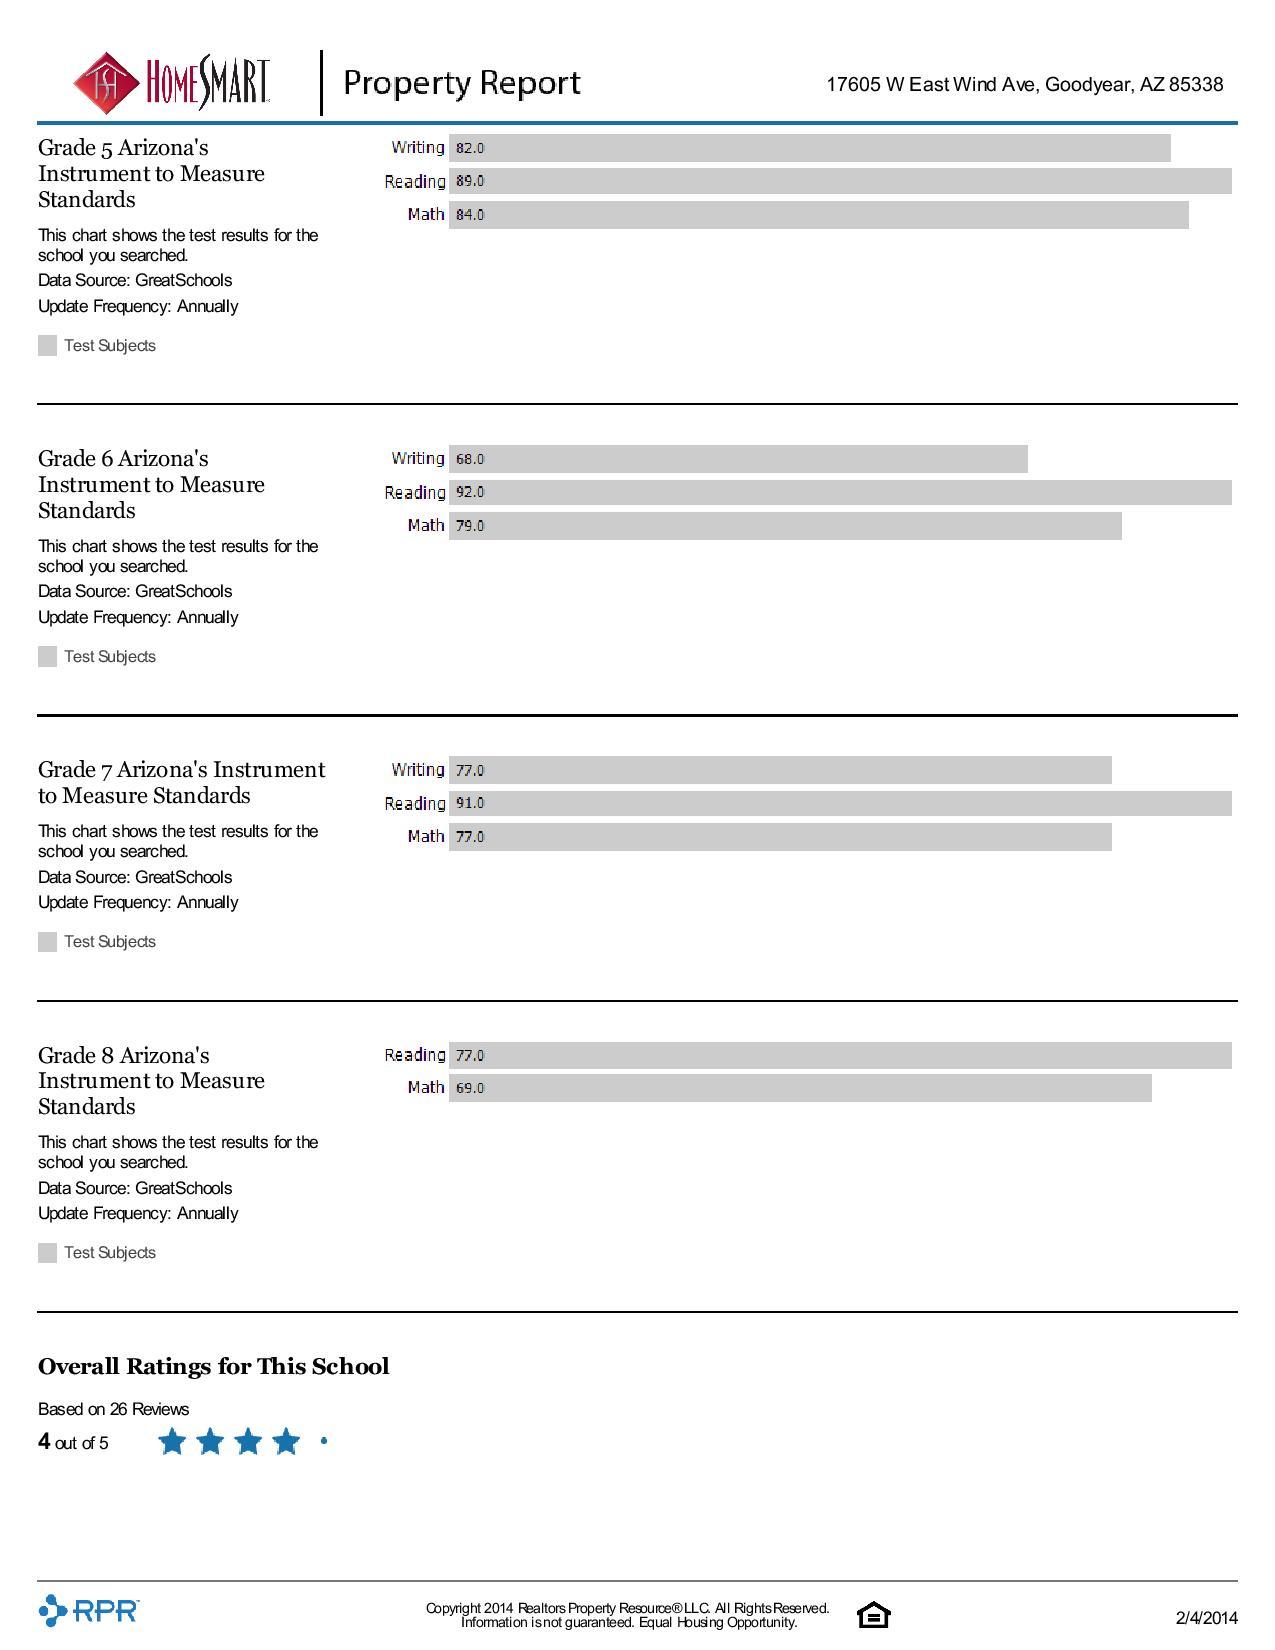 17605-W-East-Wind-Ave-Goodyear-AZ-85338.pdf-page-011